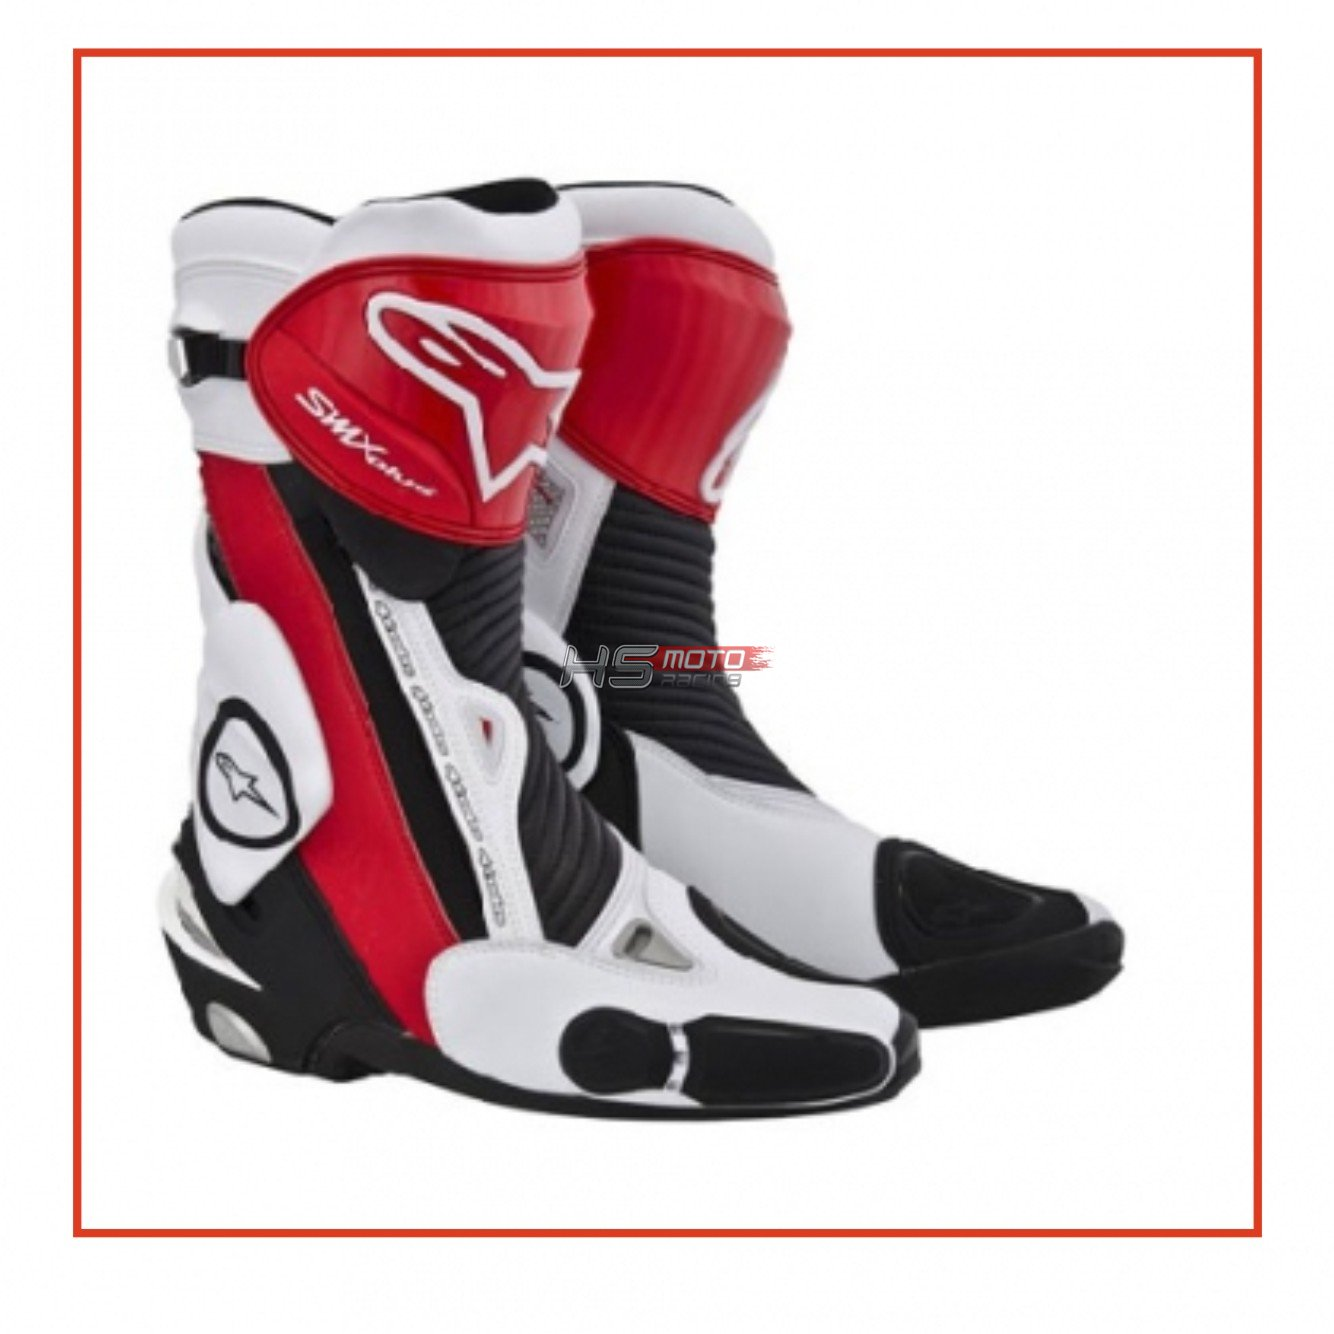 ALPINESTARS Čižmy S-MX Plus (čierno bielo červené) 7cecb3aab89